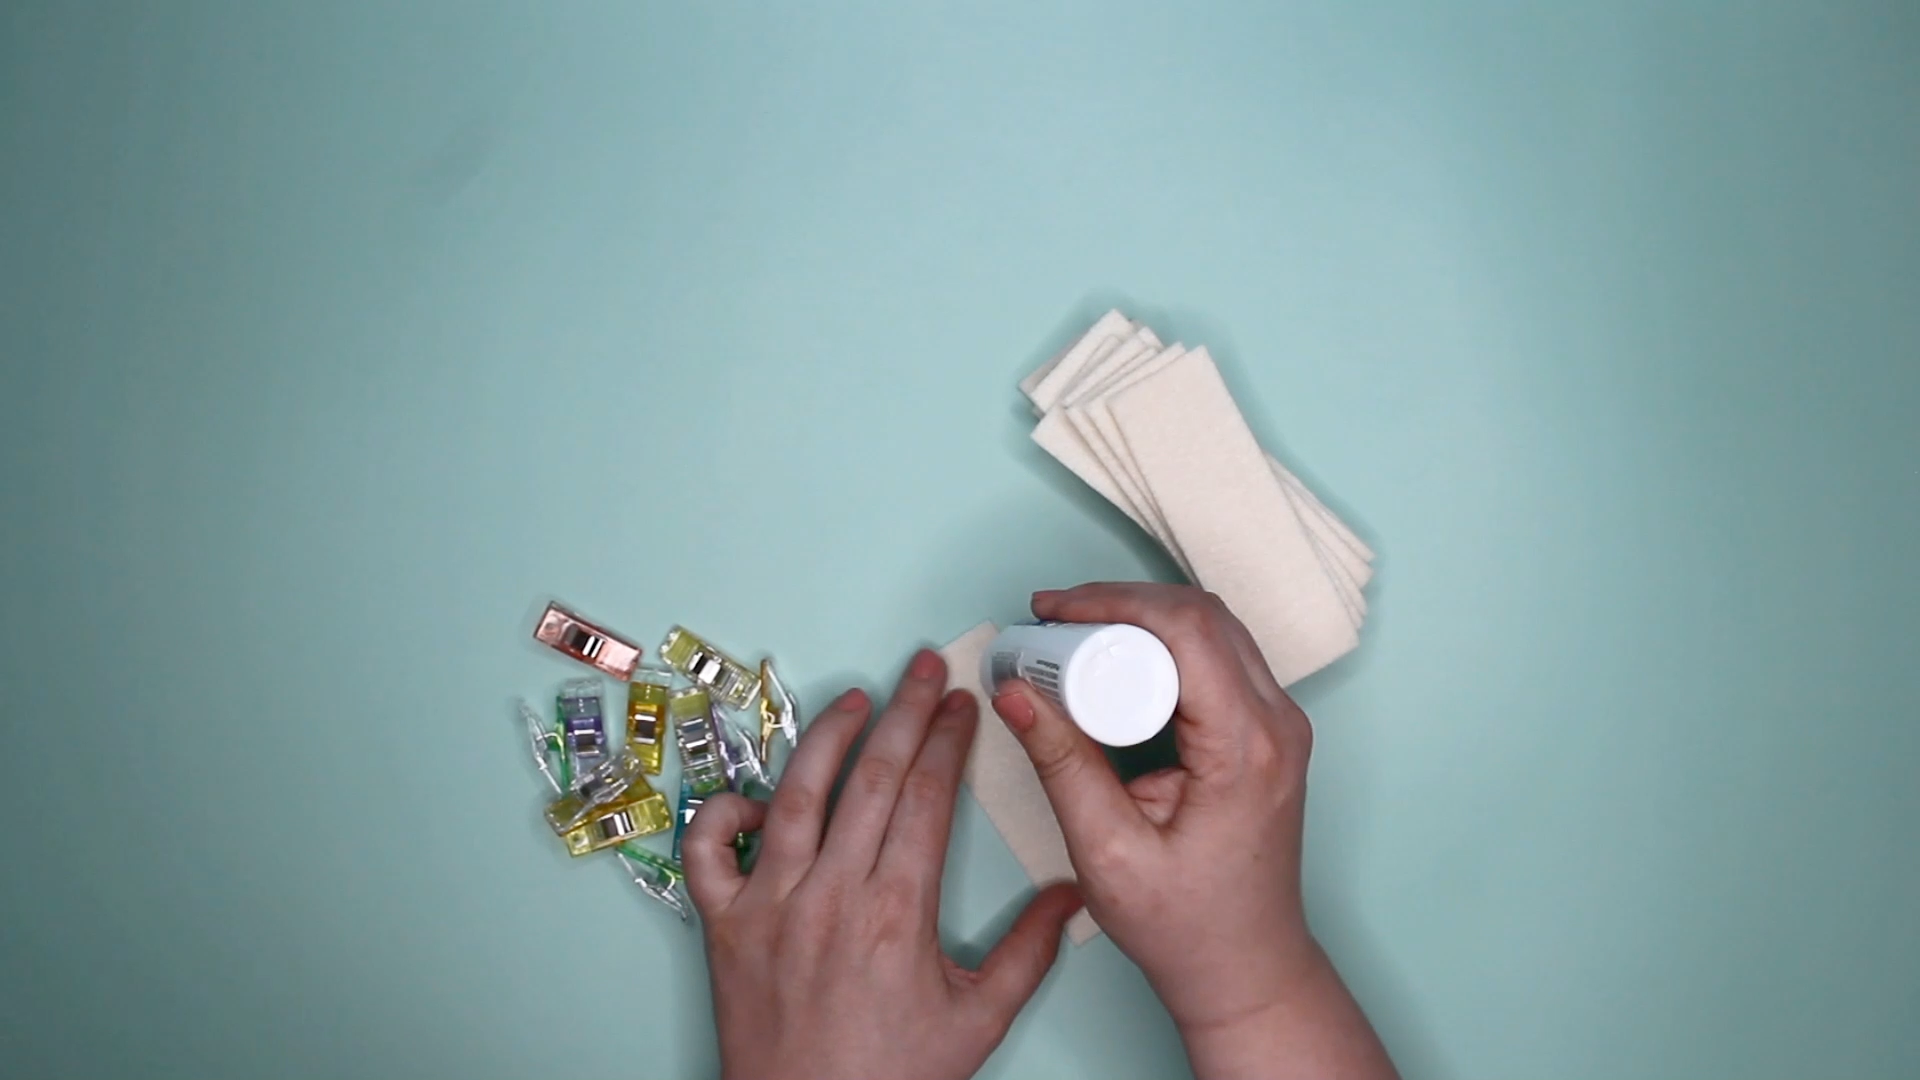 DIY Felt Play Food: step 9b